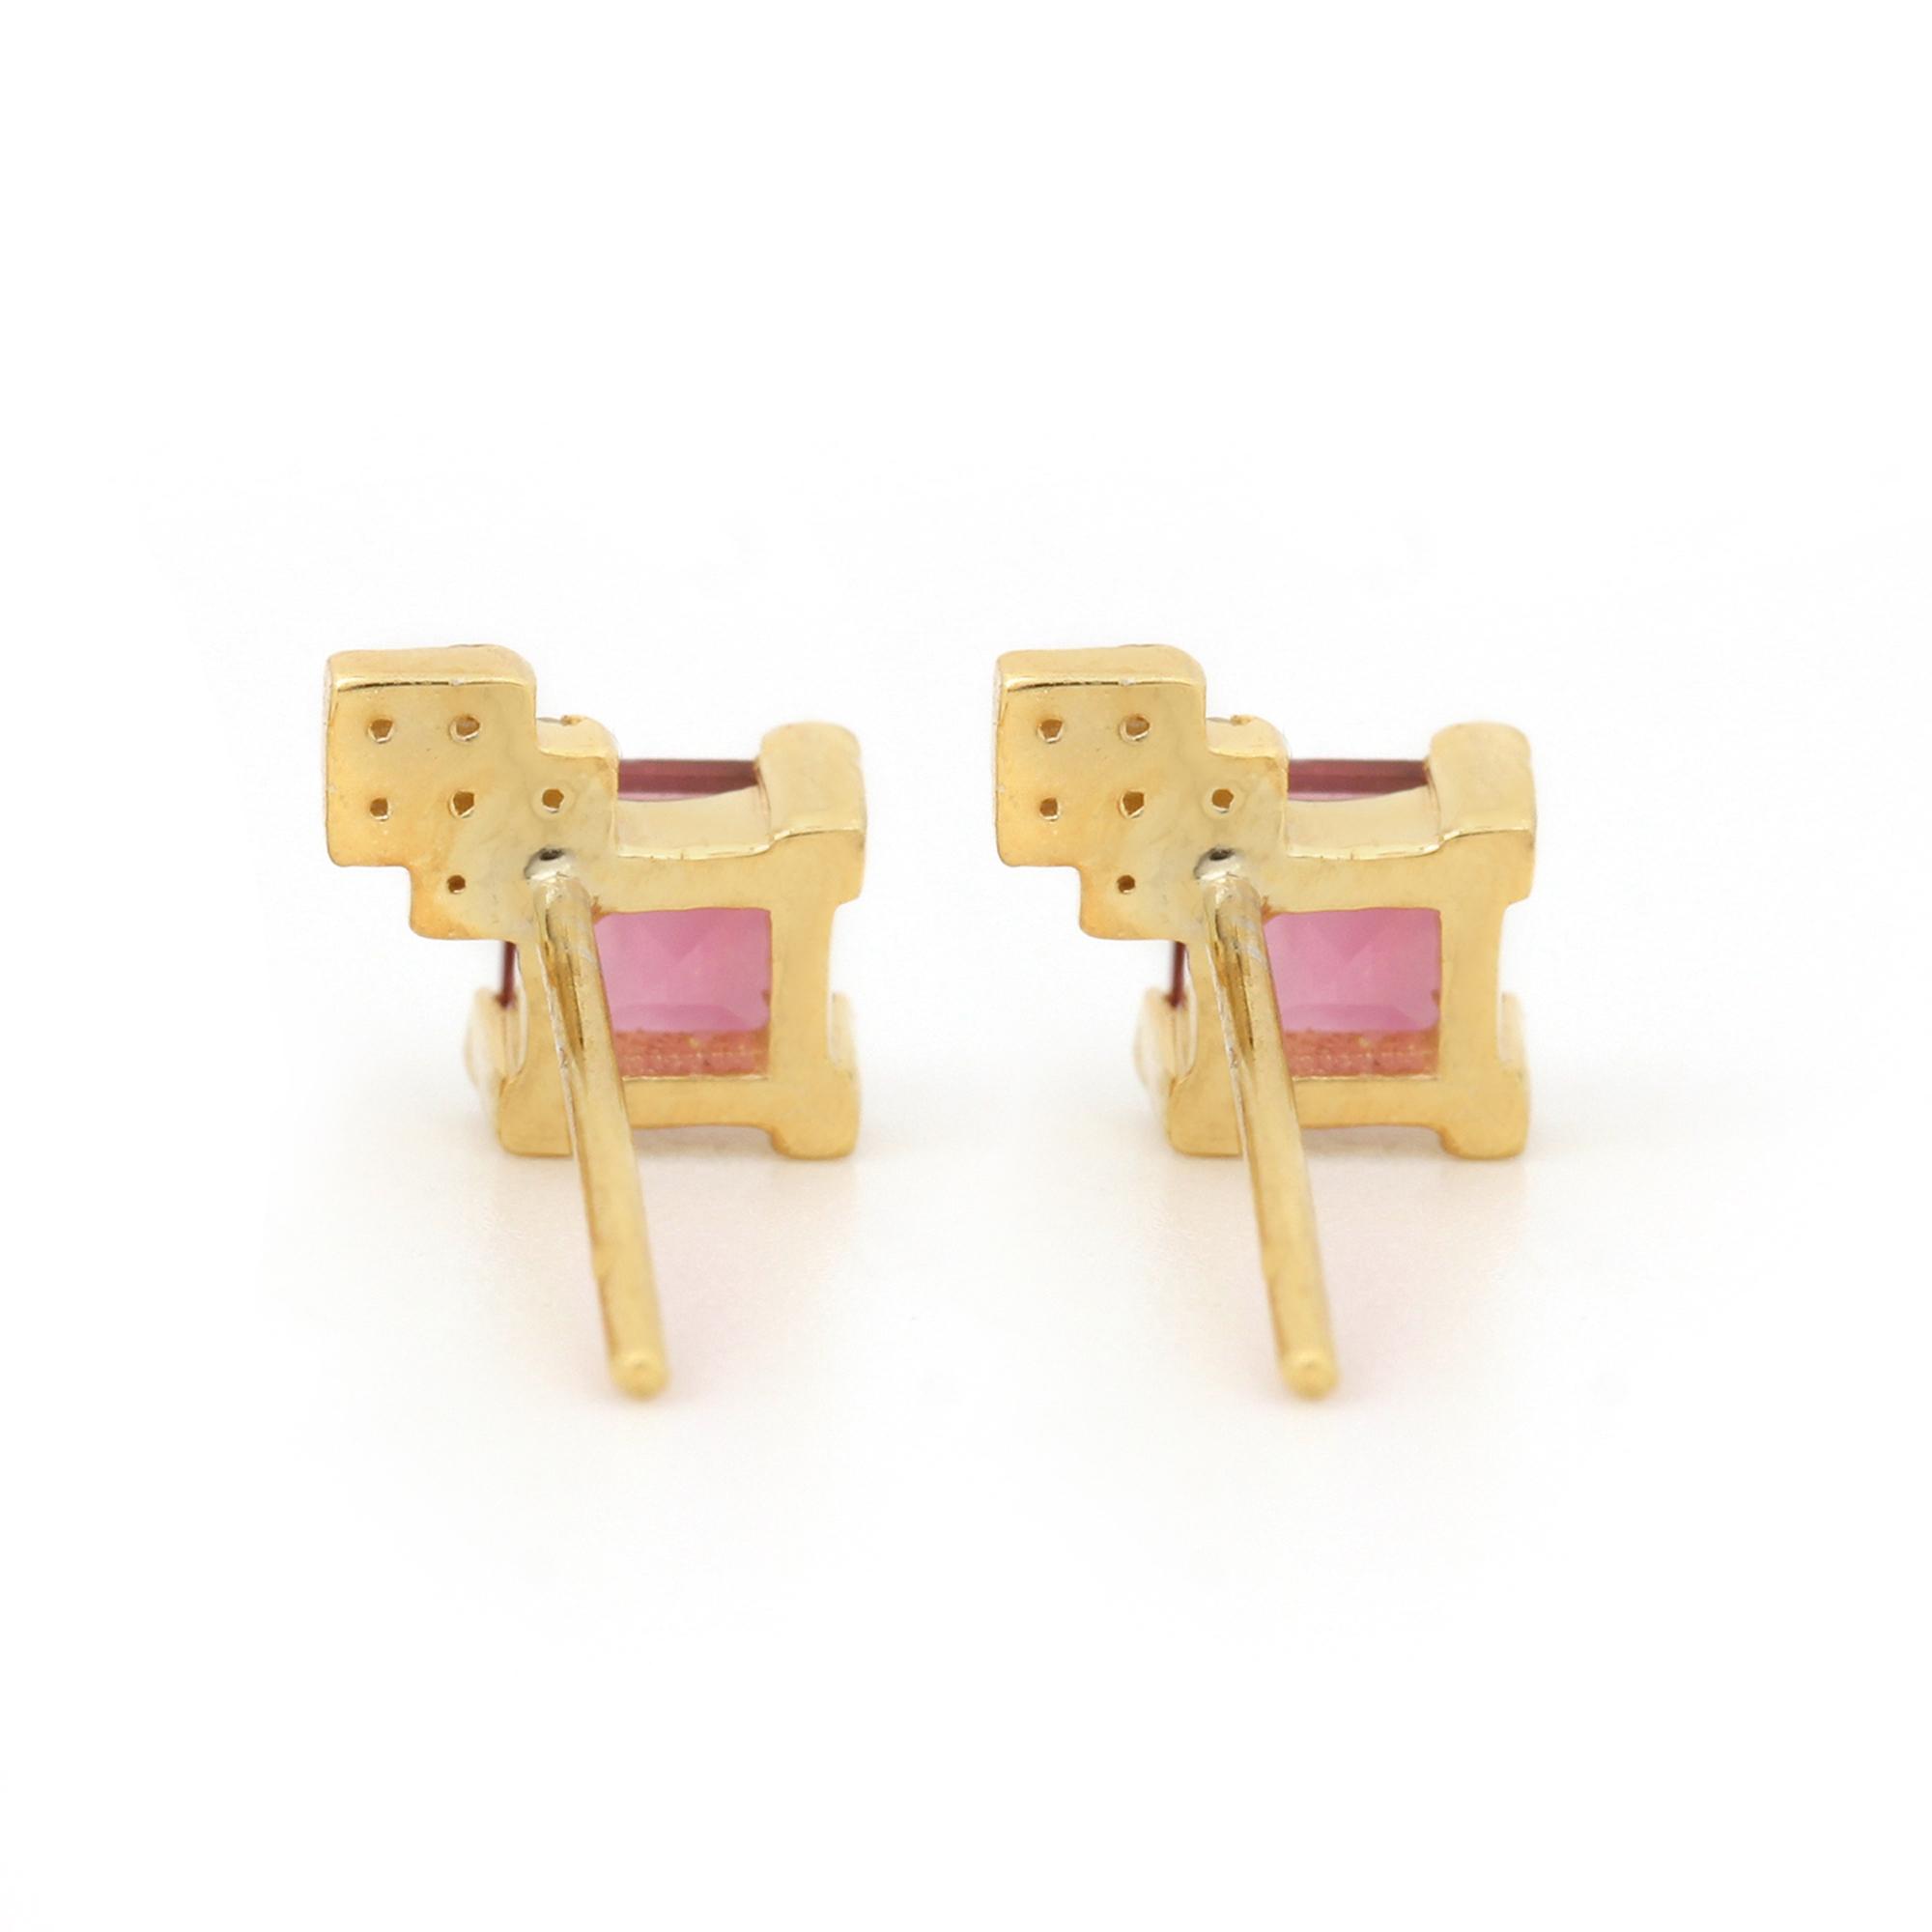 14k Solid Gold Diamond & Pink Tourmaline Solitaire Stud Earrings Fine Jewelry